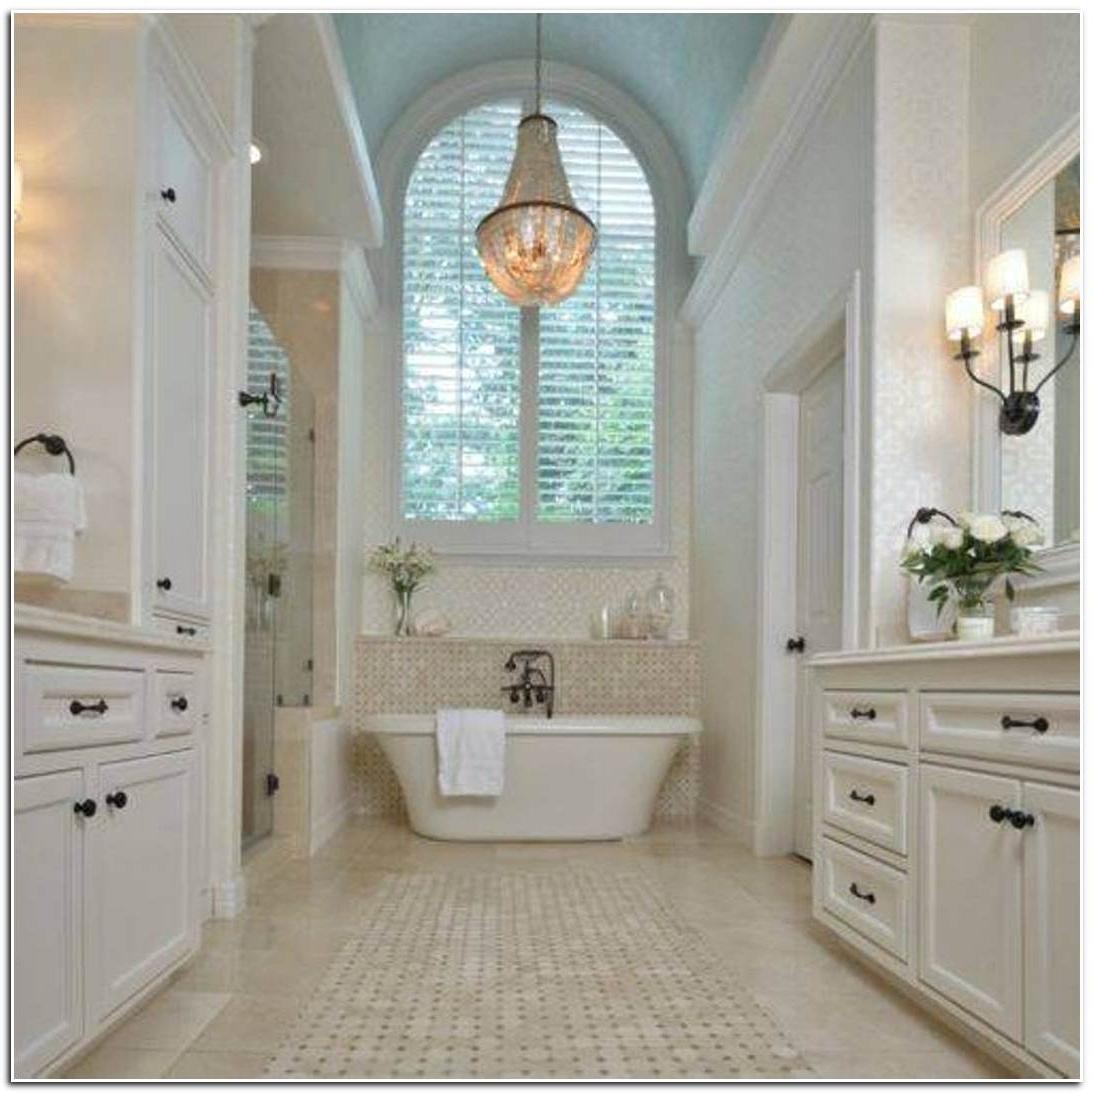 Chandelier In The Bathroom In Favorite Attractive Bathroom Crystal Chandelier 1000 Ideas About Bathroom (View 3 of 15)